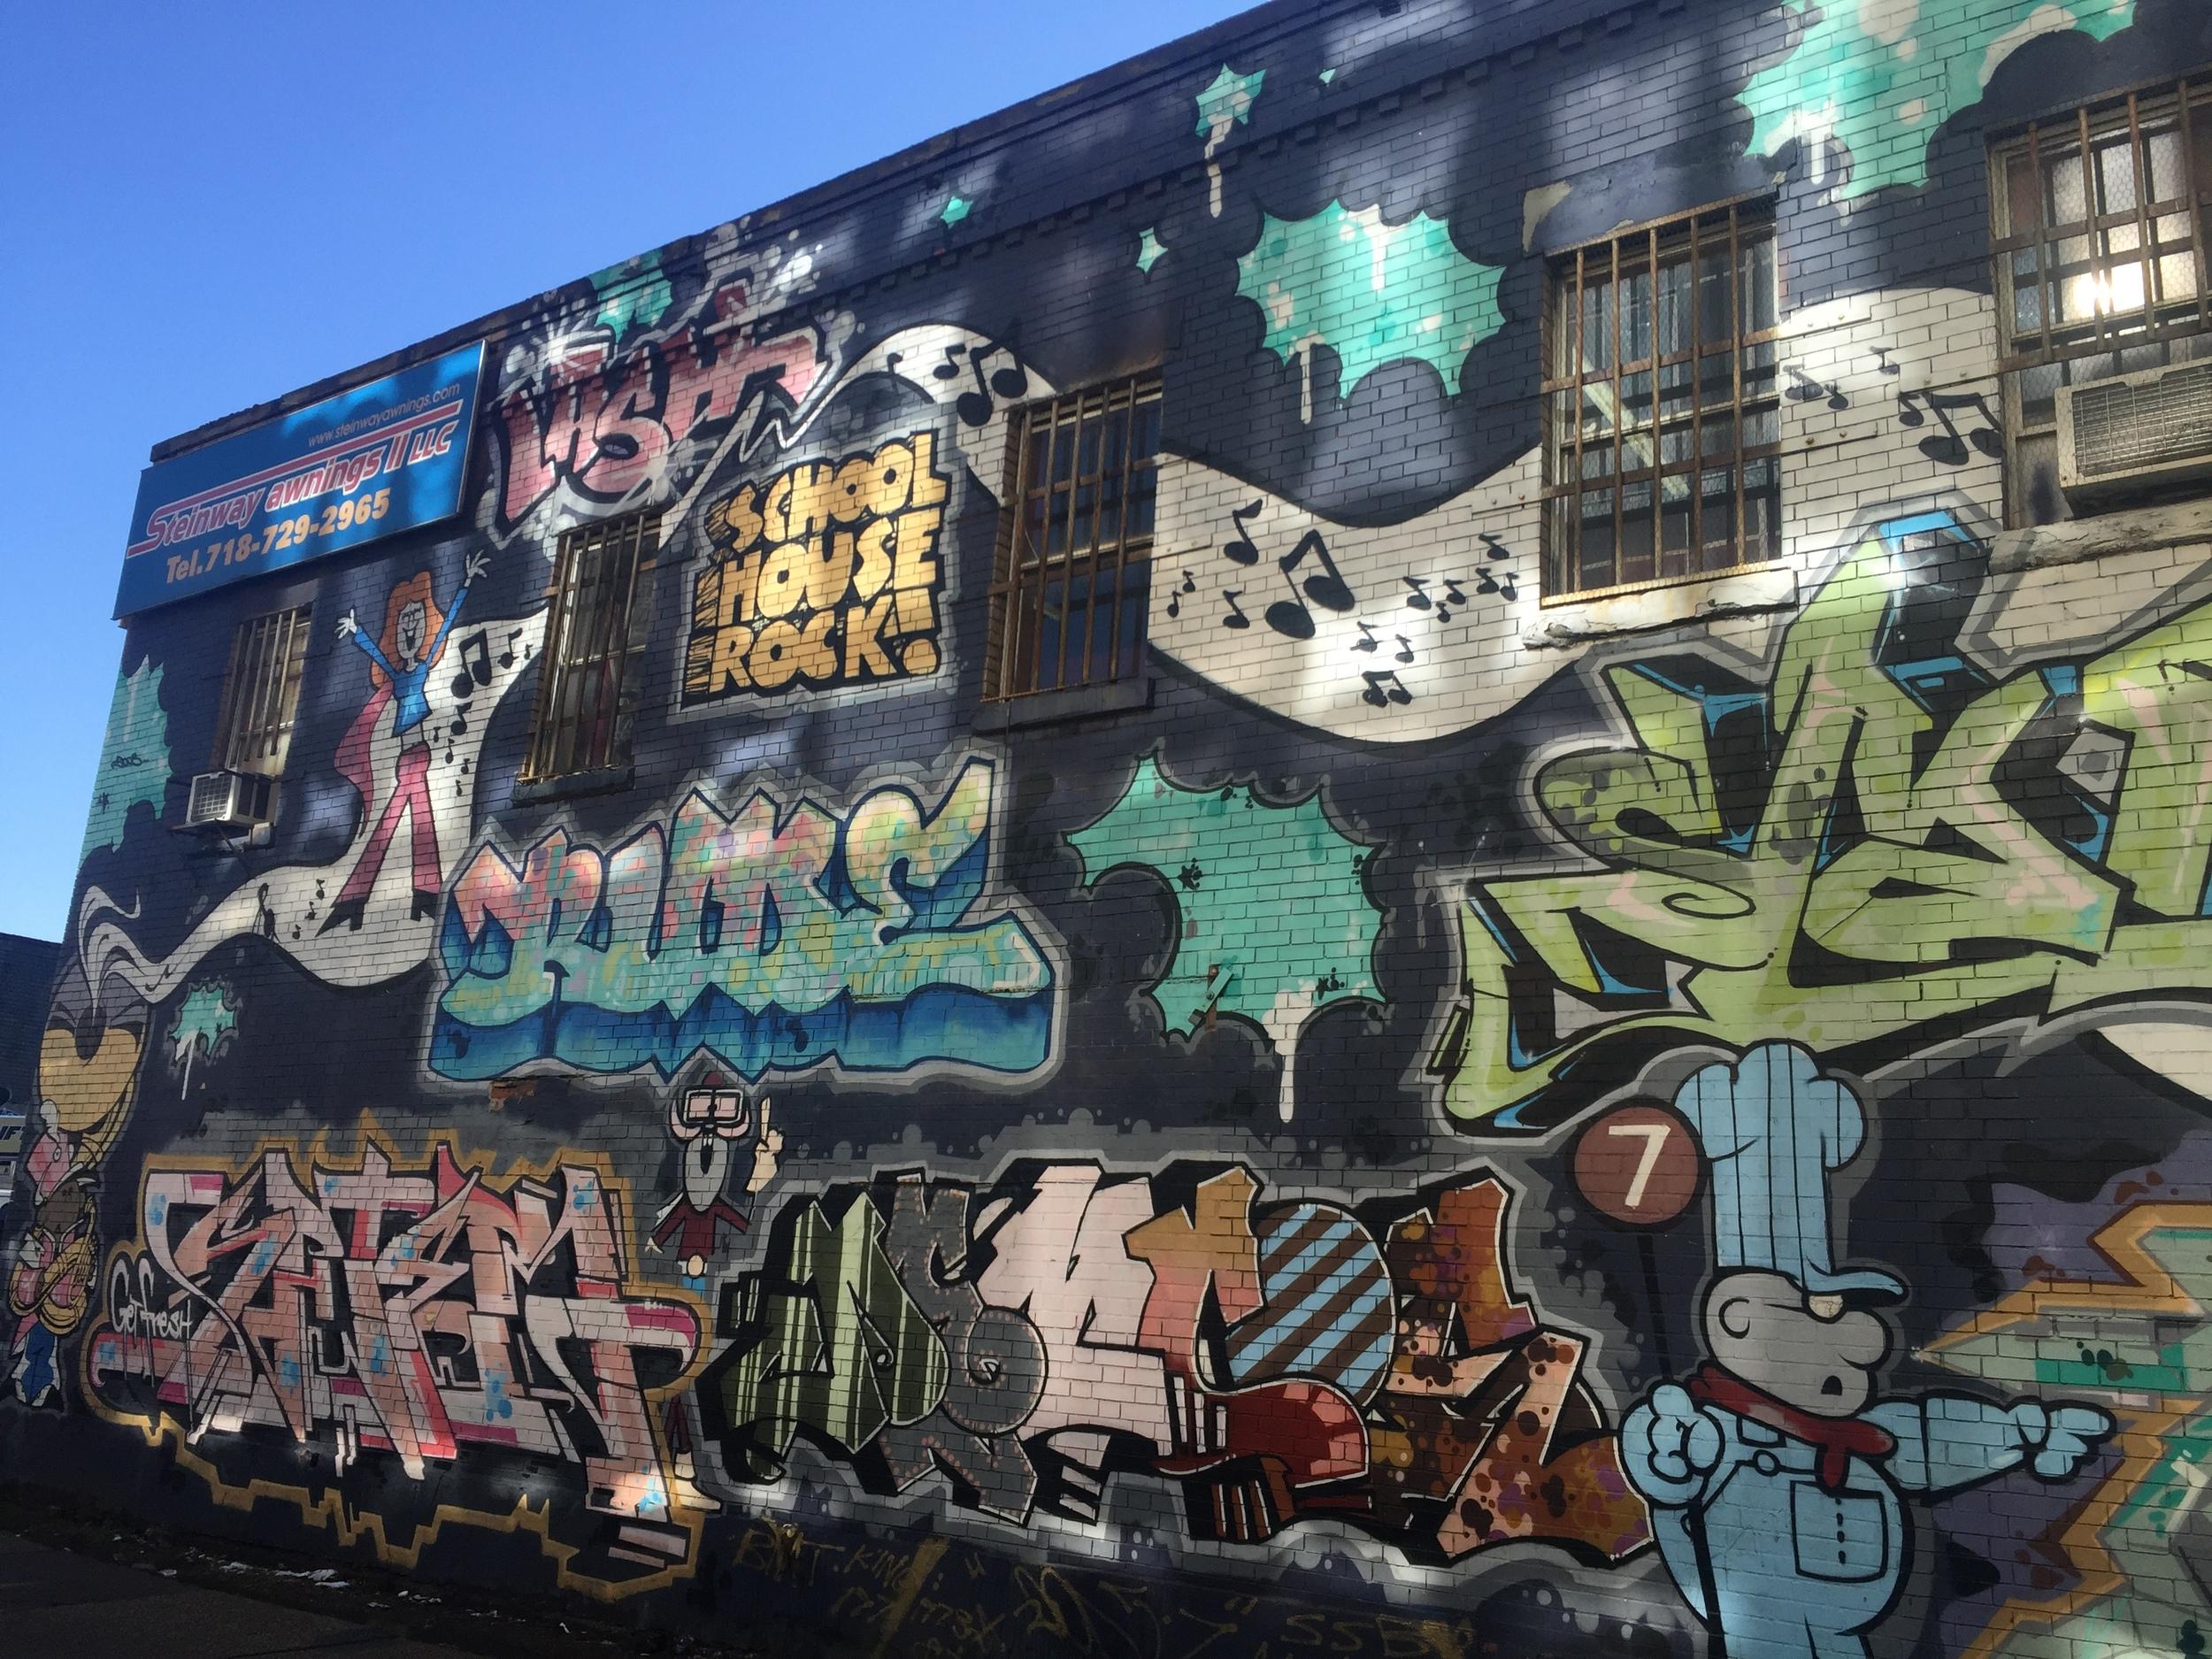 School House Rocks graffiti in Long Island City, Queens.